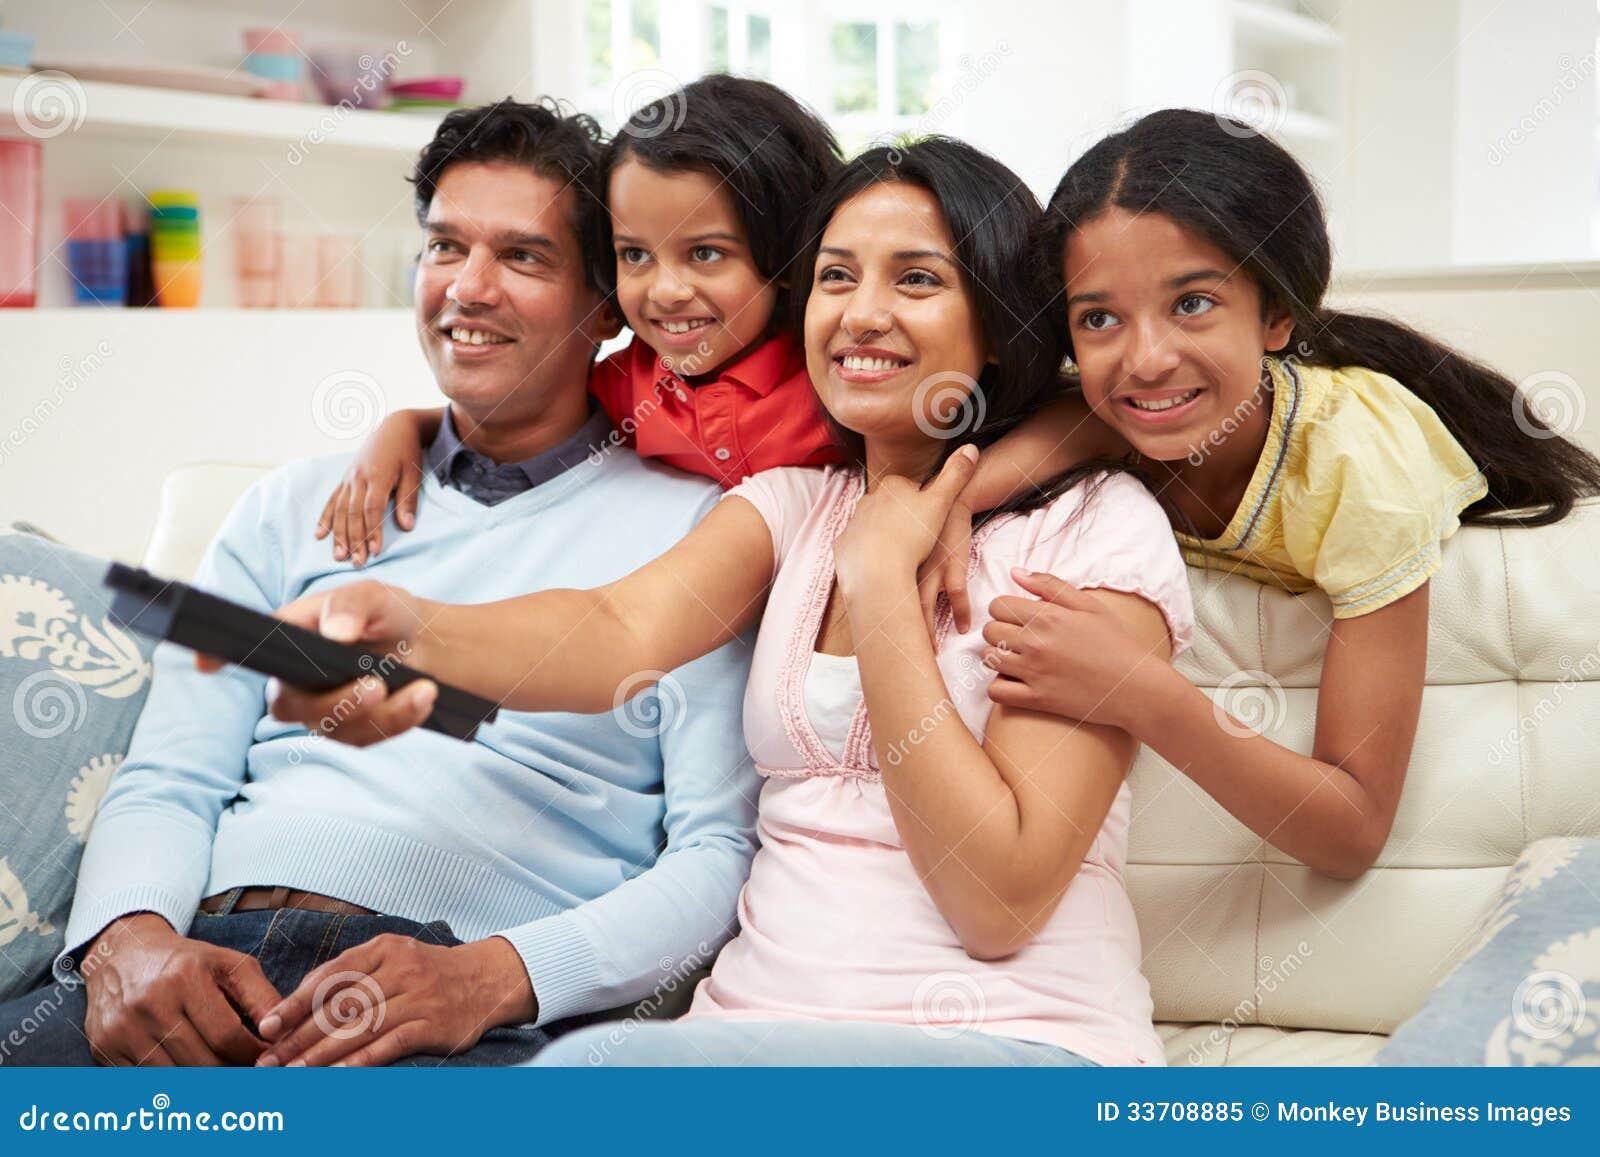 family watching tv together cartoon vector cartoondealer